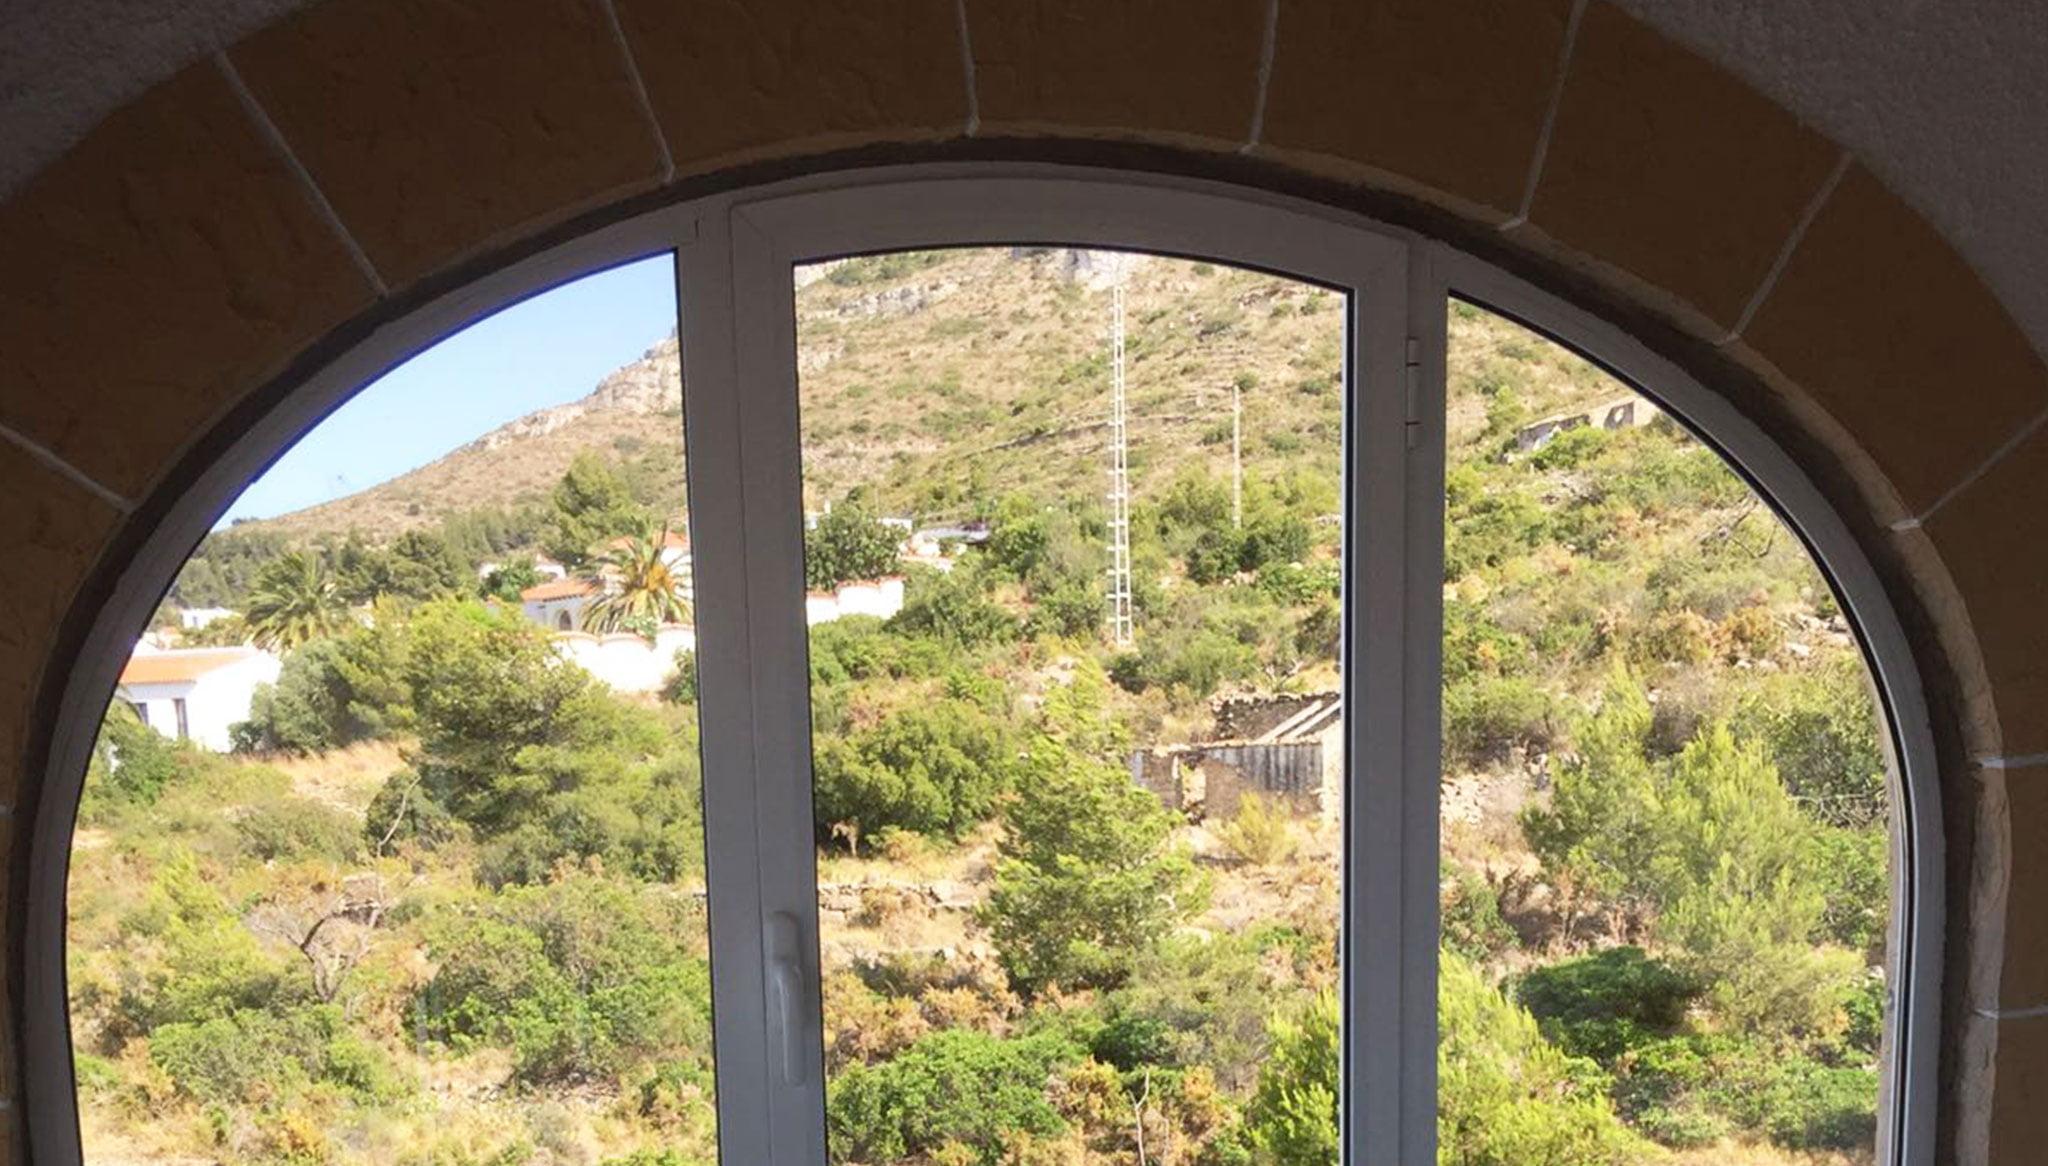 Ventana curva ajustada a un arco – Alucardona Pvc y Aluminios, S.L